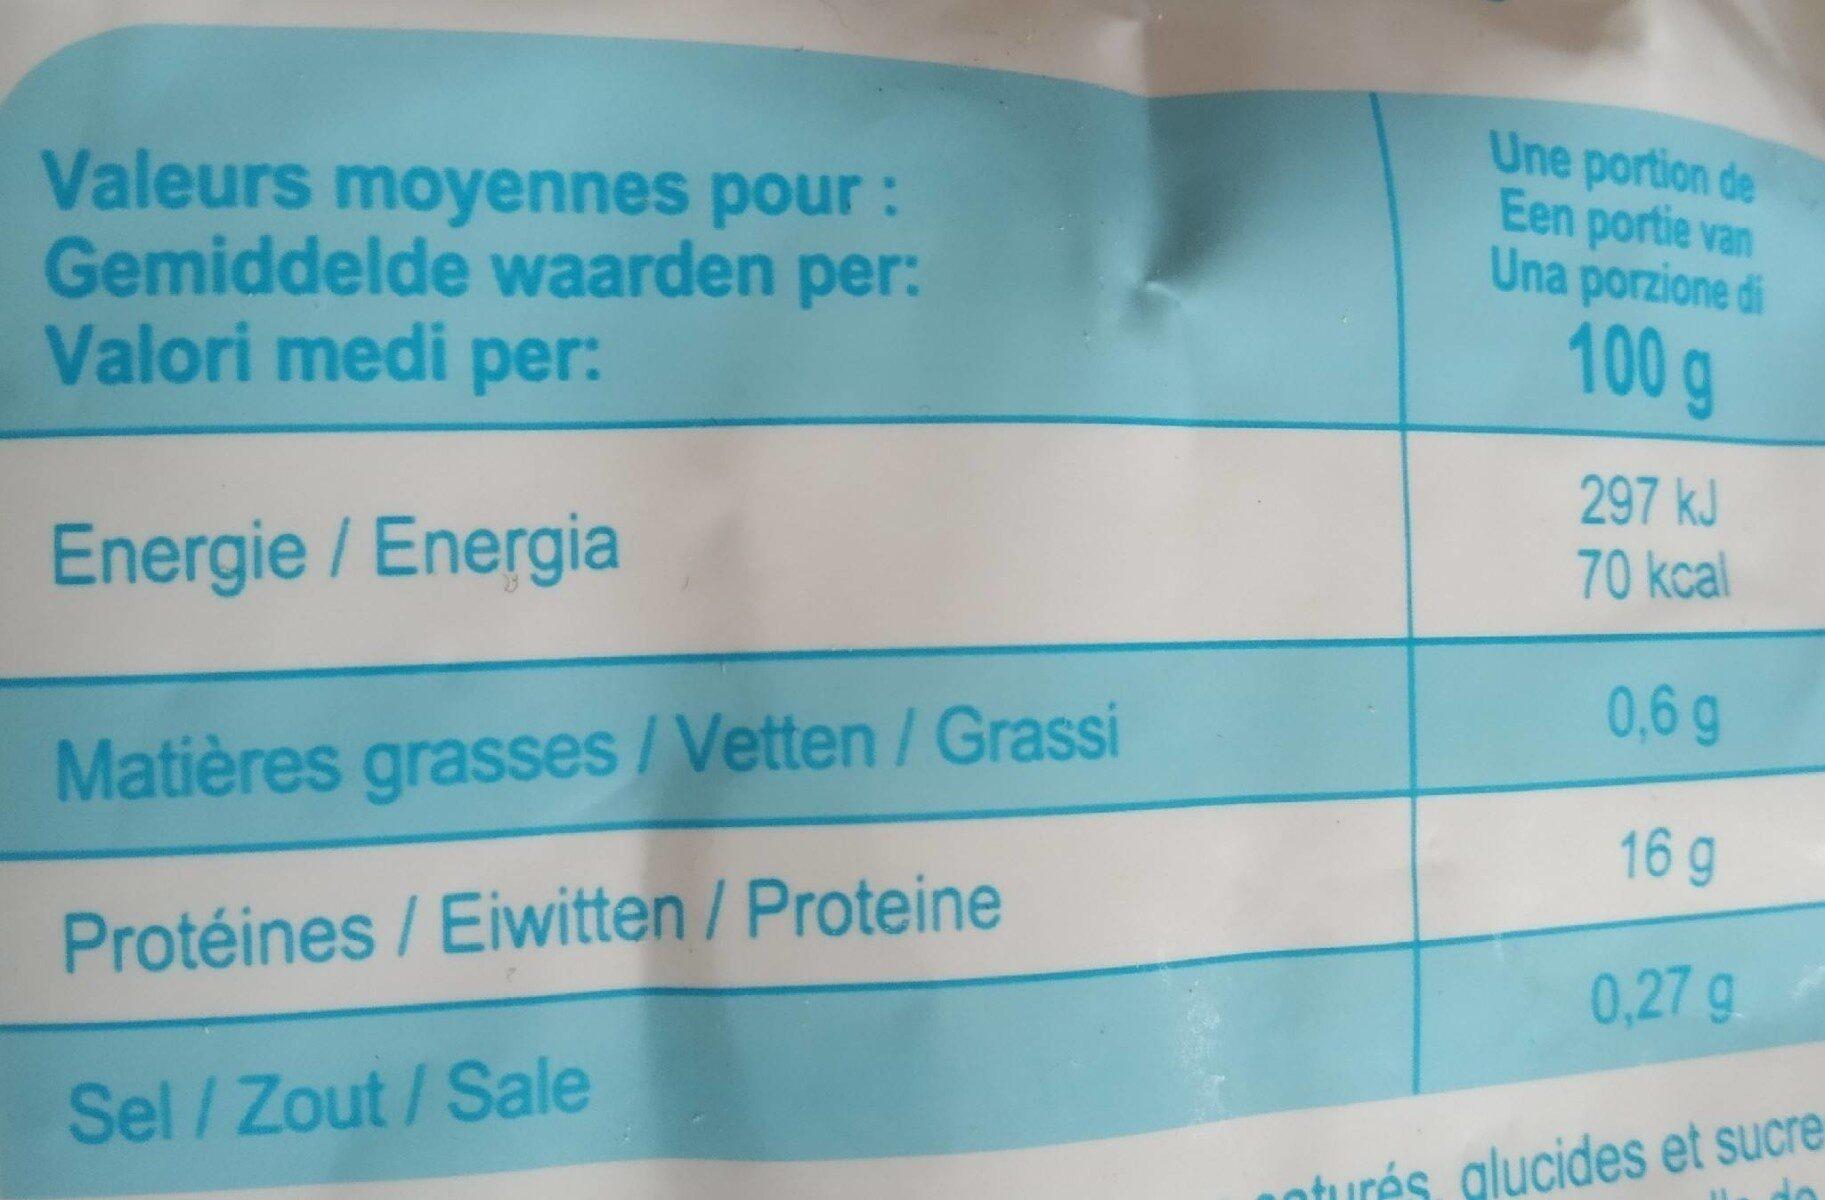 Filets de colin d'Alaska - Informations nutritionnelles - fr